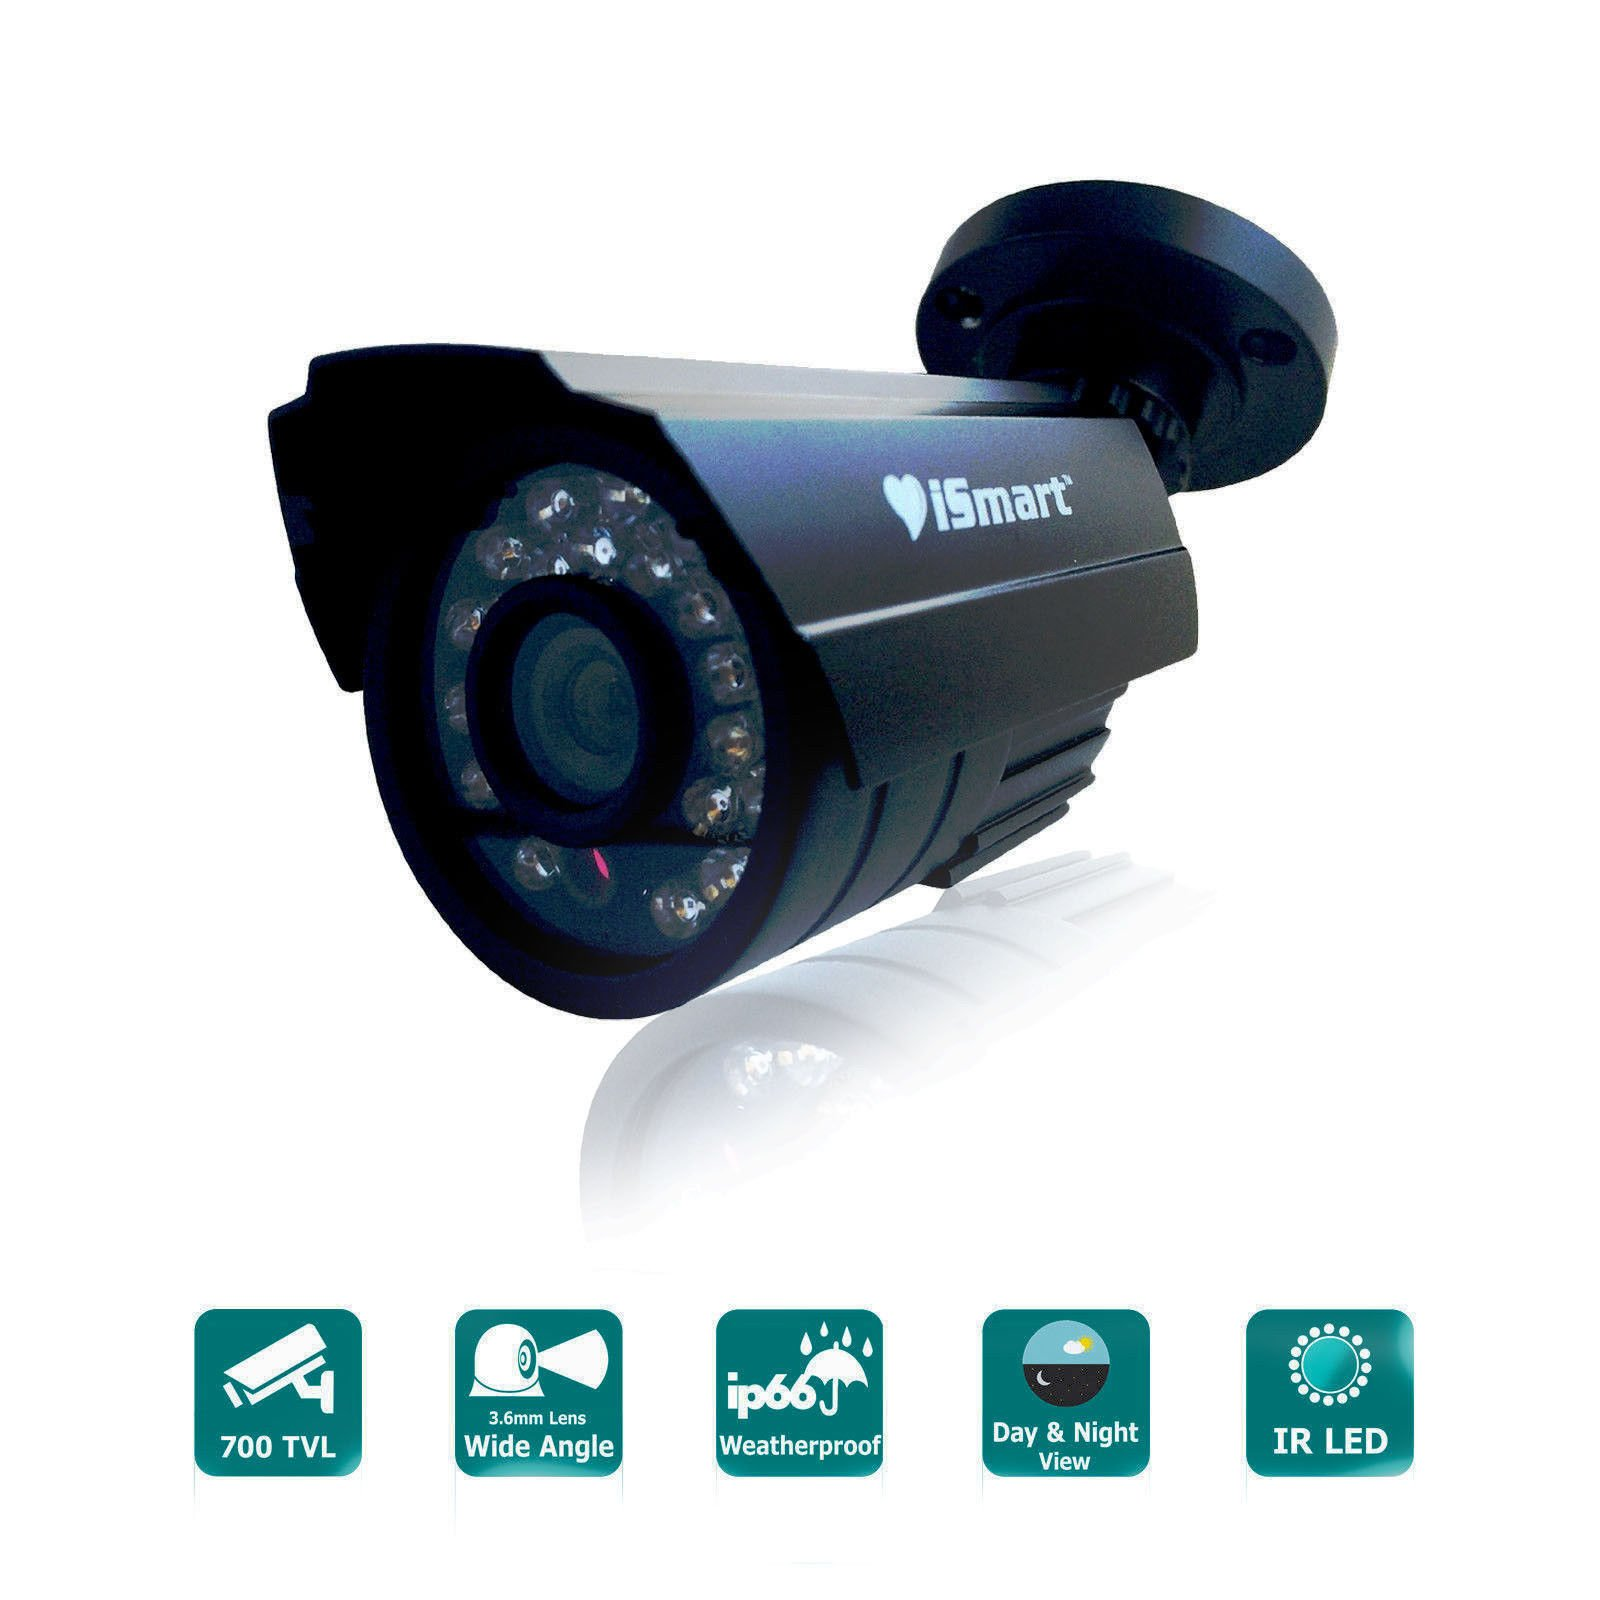 iSmart 700TVL IP66 CCTV Home Surveillance Weatherproof 3.6mm Lens with IR Cut Bullet Security Camera 24PCS Infrared LEDs, 60ft IR Distance, Aluminum Metal Housing (Black) C1030DP7 by iSmart